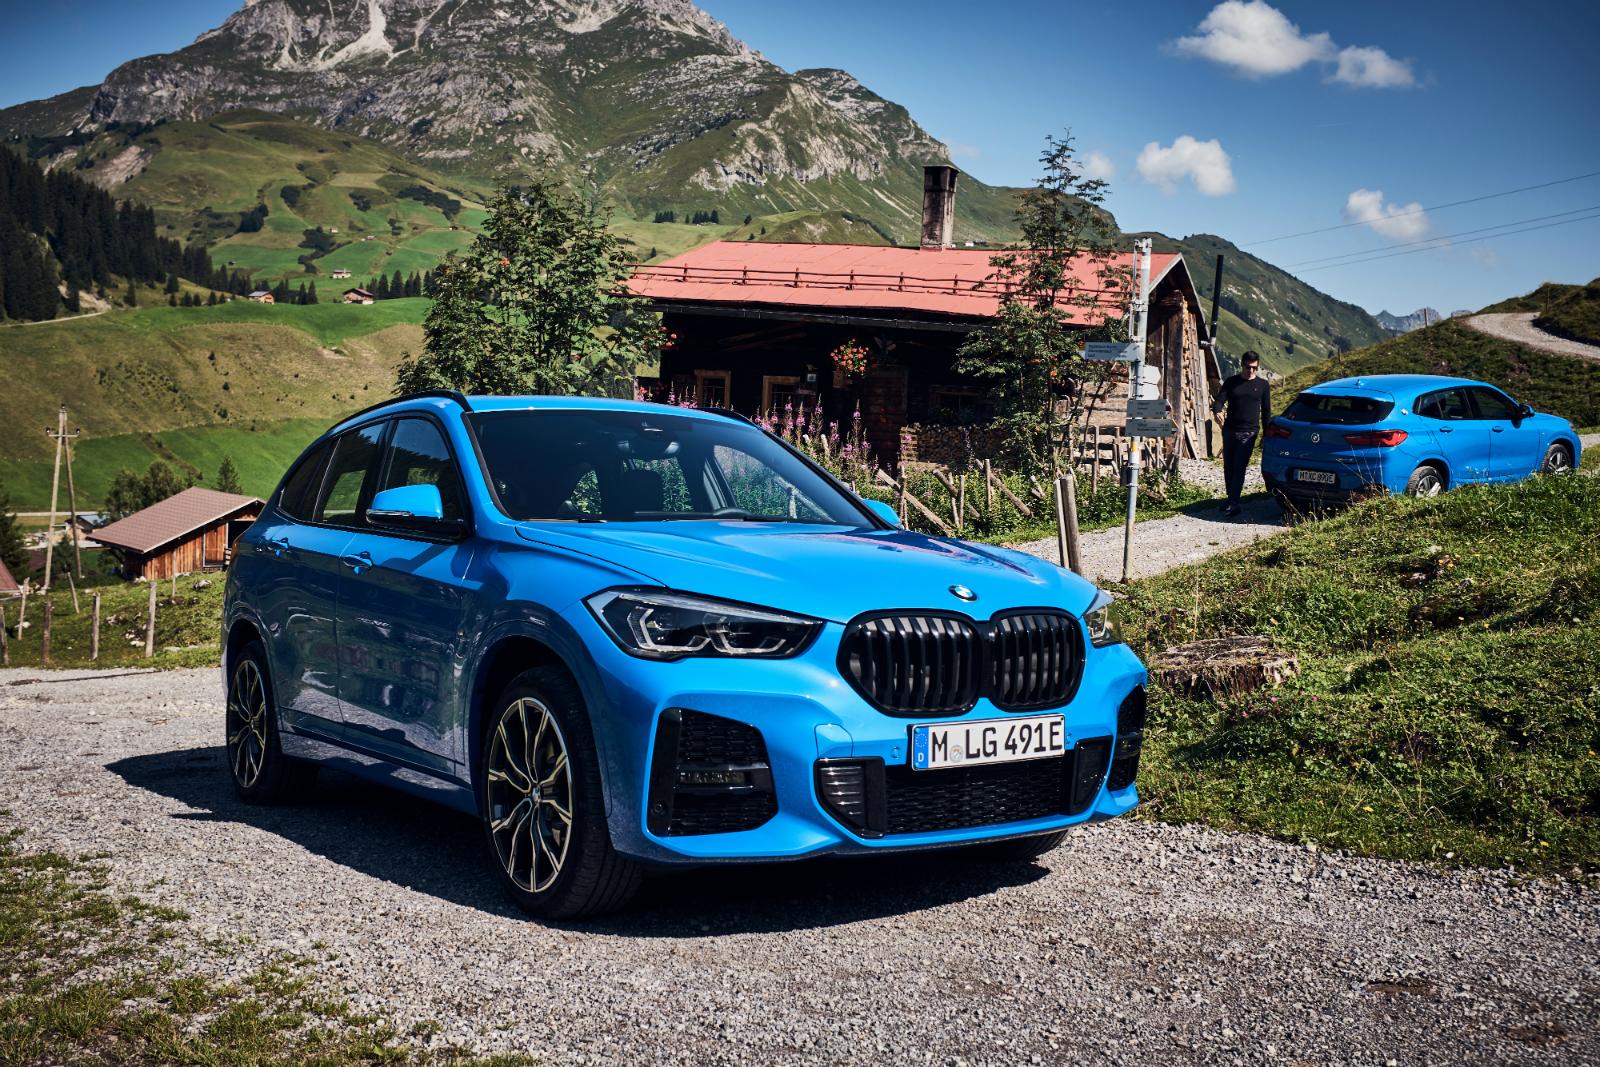 Noi modele BMW X plug-in hybrid: debuteaza BMW X1 xDrive25e, urmeaza BMW X2 xDrive25e